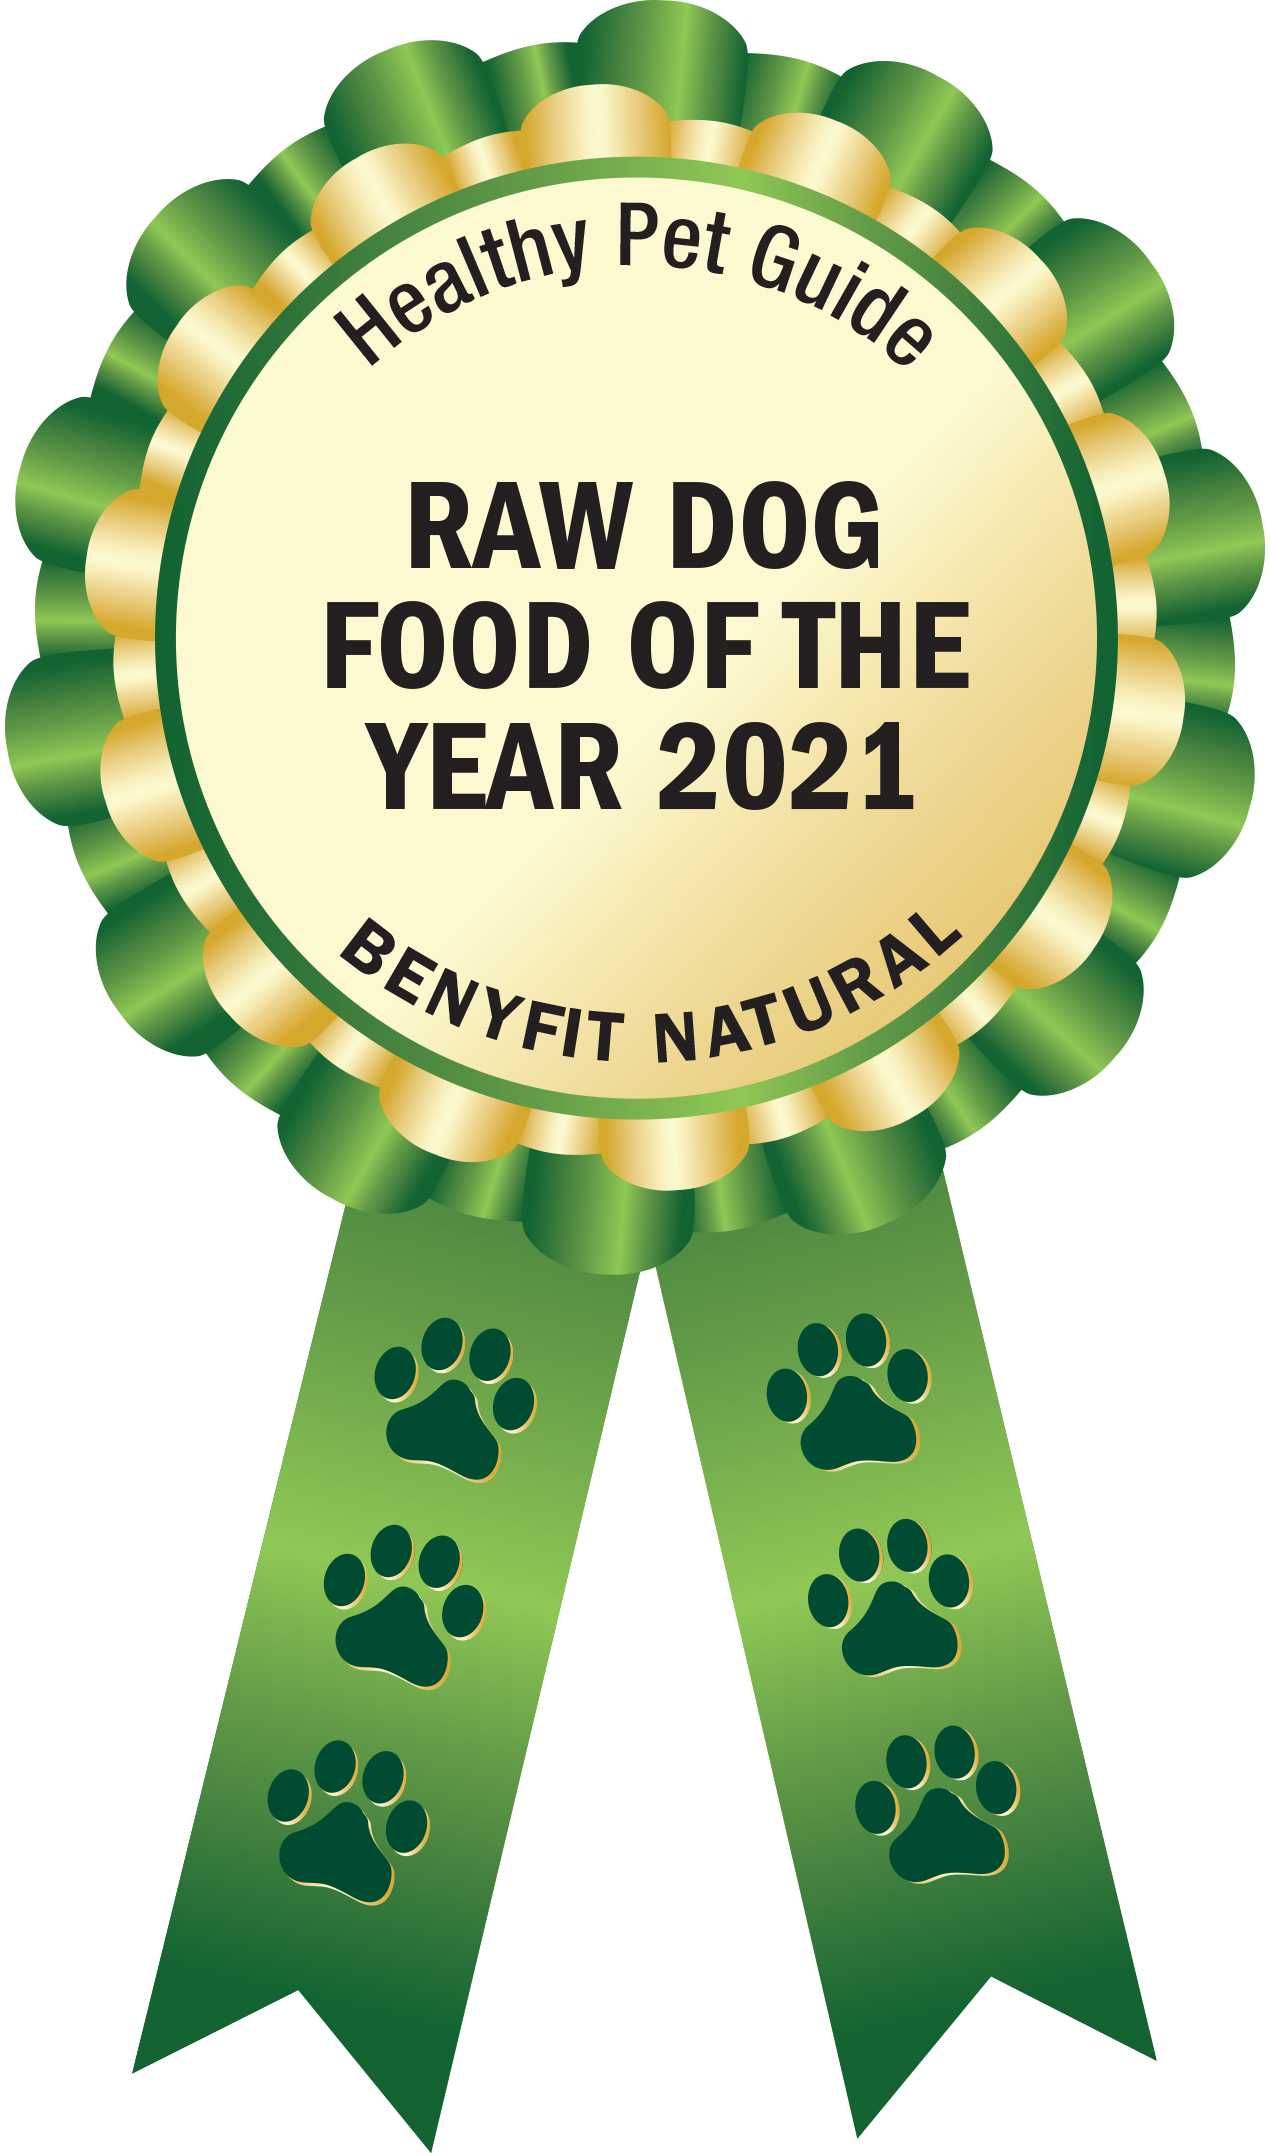 Rosette Benyfit Natural award